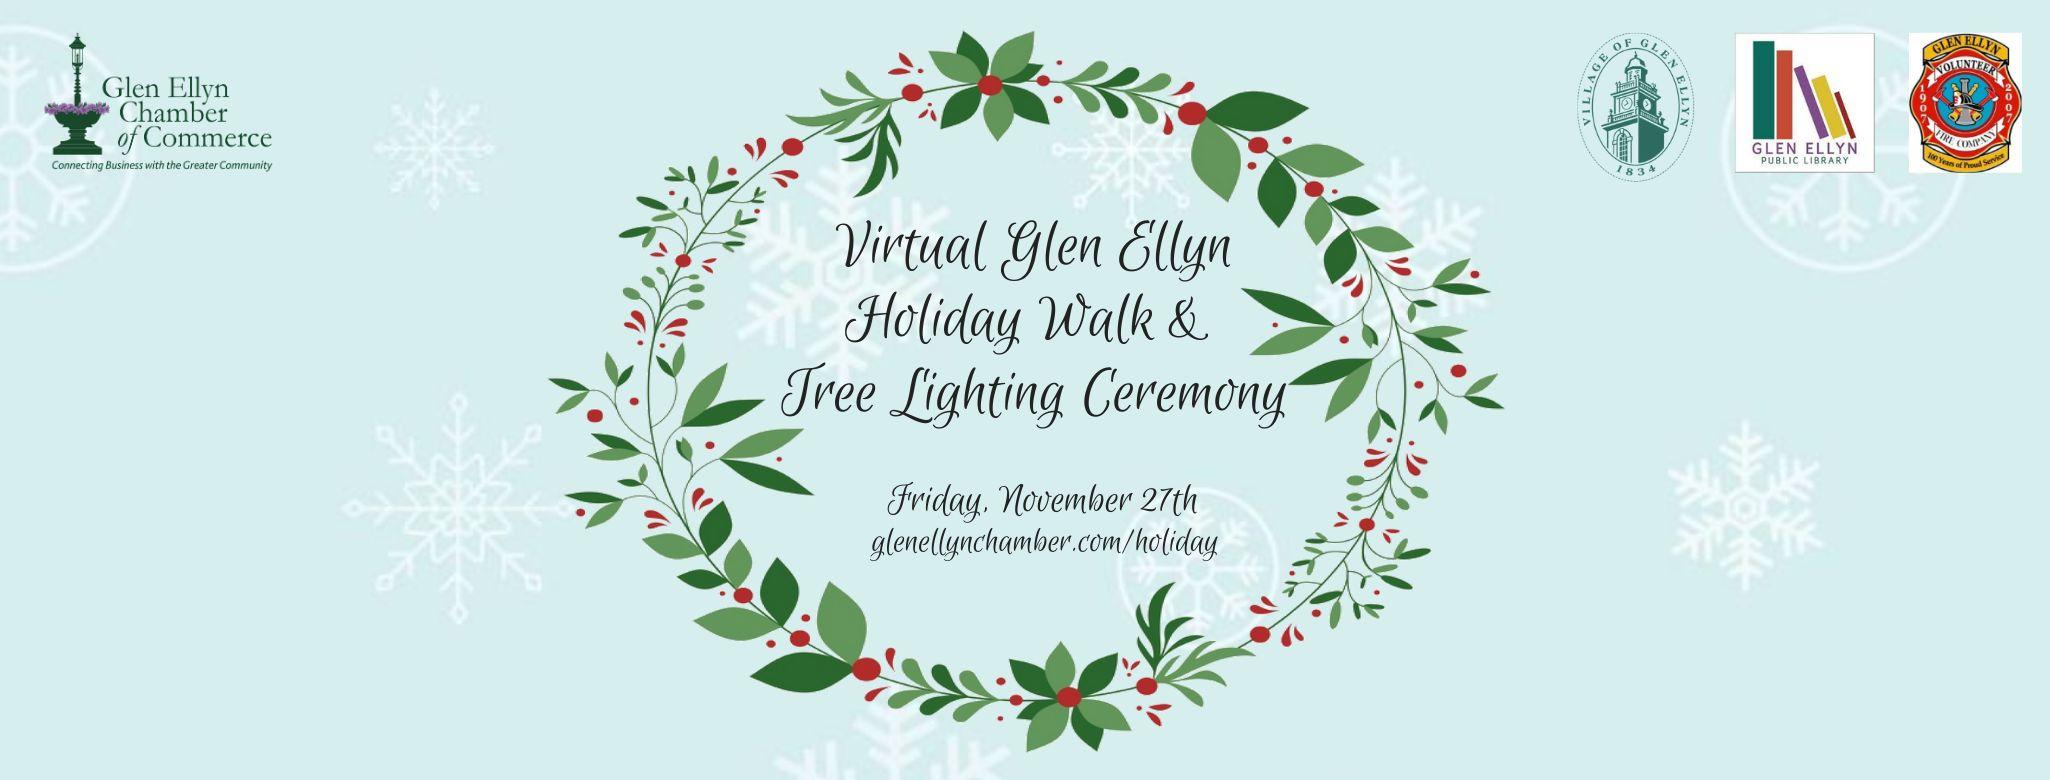 Virtual Glen Ellyn Holiday Walk & Tree Lighting Ceremony (2)